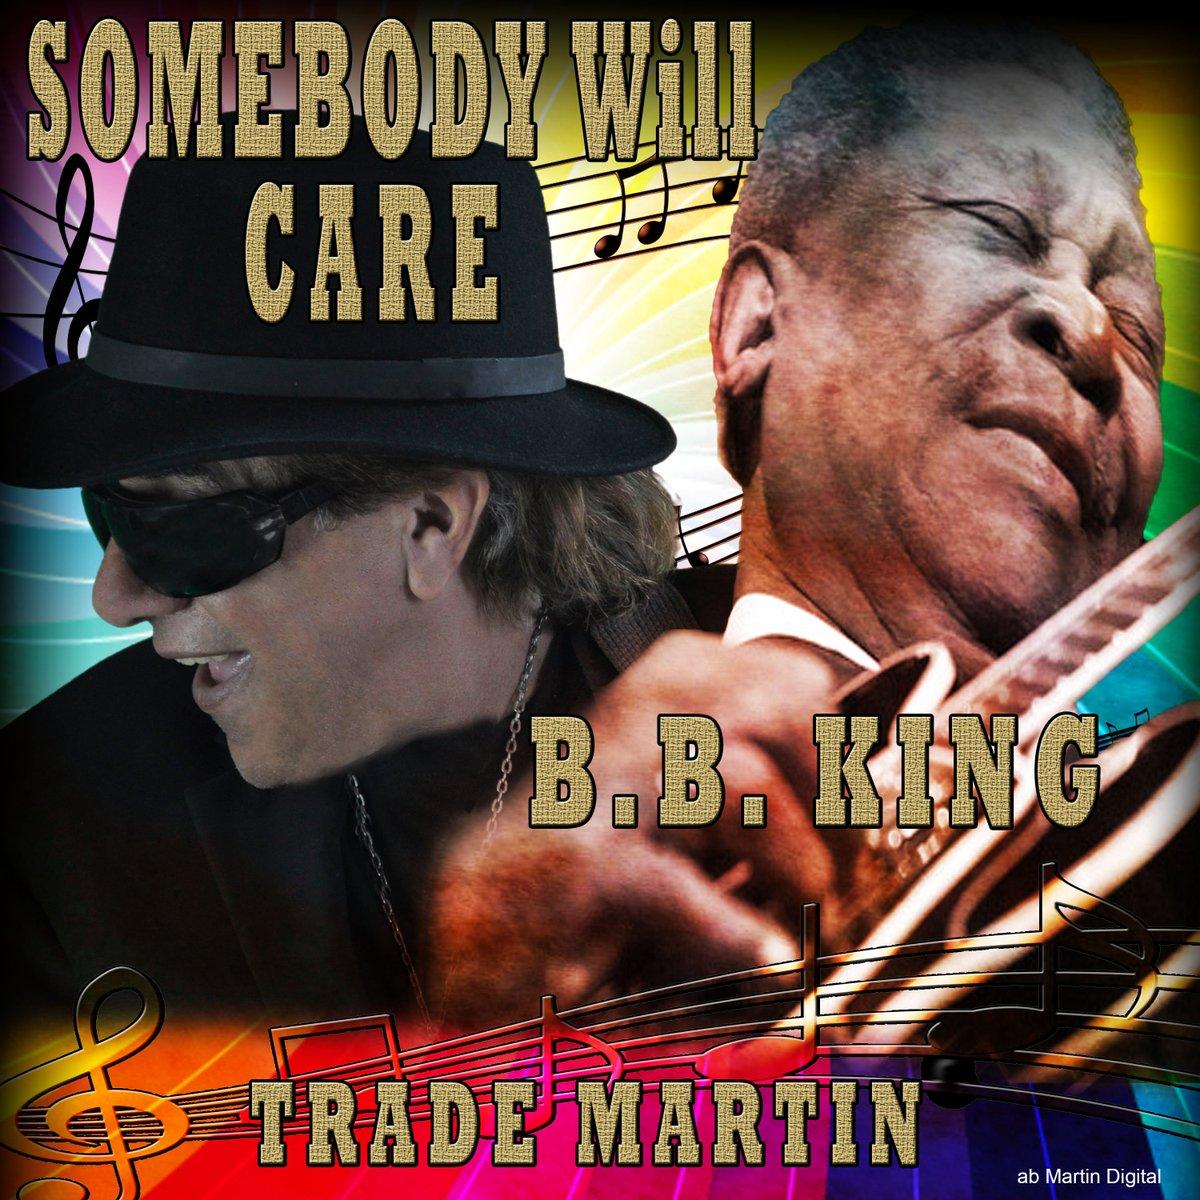 @future_of_music .Somebody Will Care – Unreleased BB KING https://www.youtube.com/watch?v=MBkR6pQq0hQ… #BBKing #TradeMartin #abMartindigital #Amazon #iTunes #Pandora #Spotify #AppleMusic